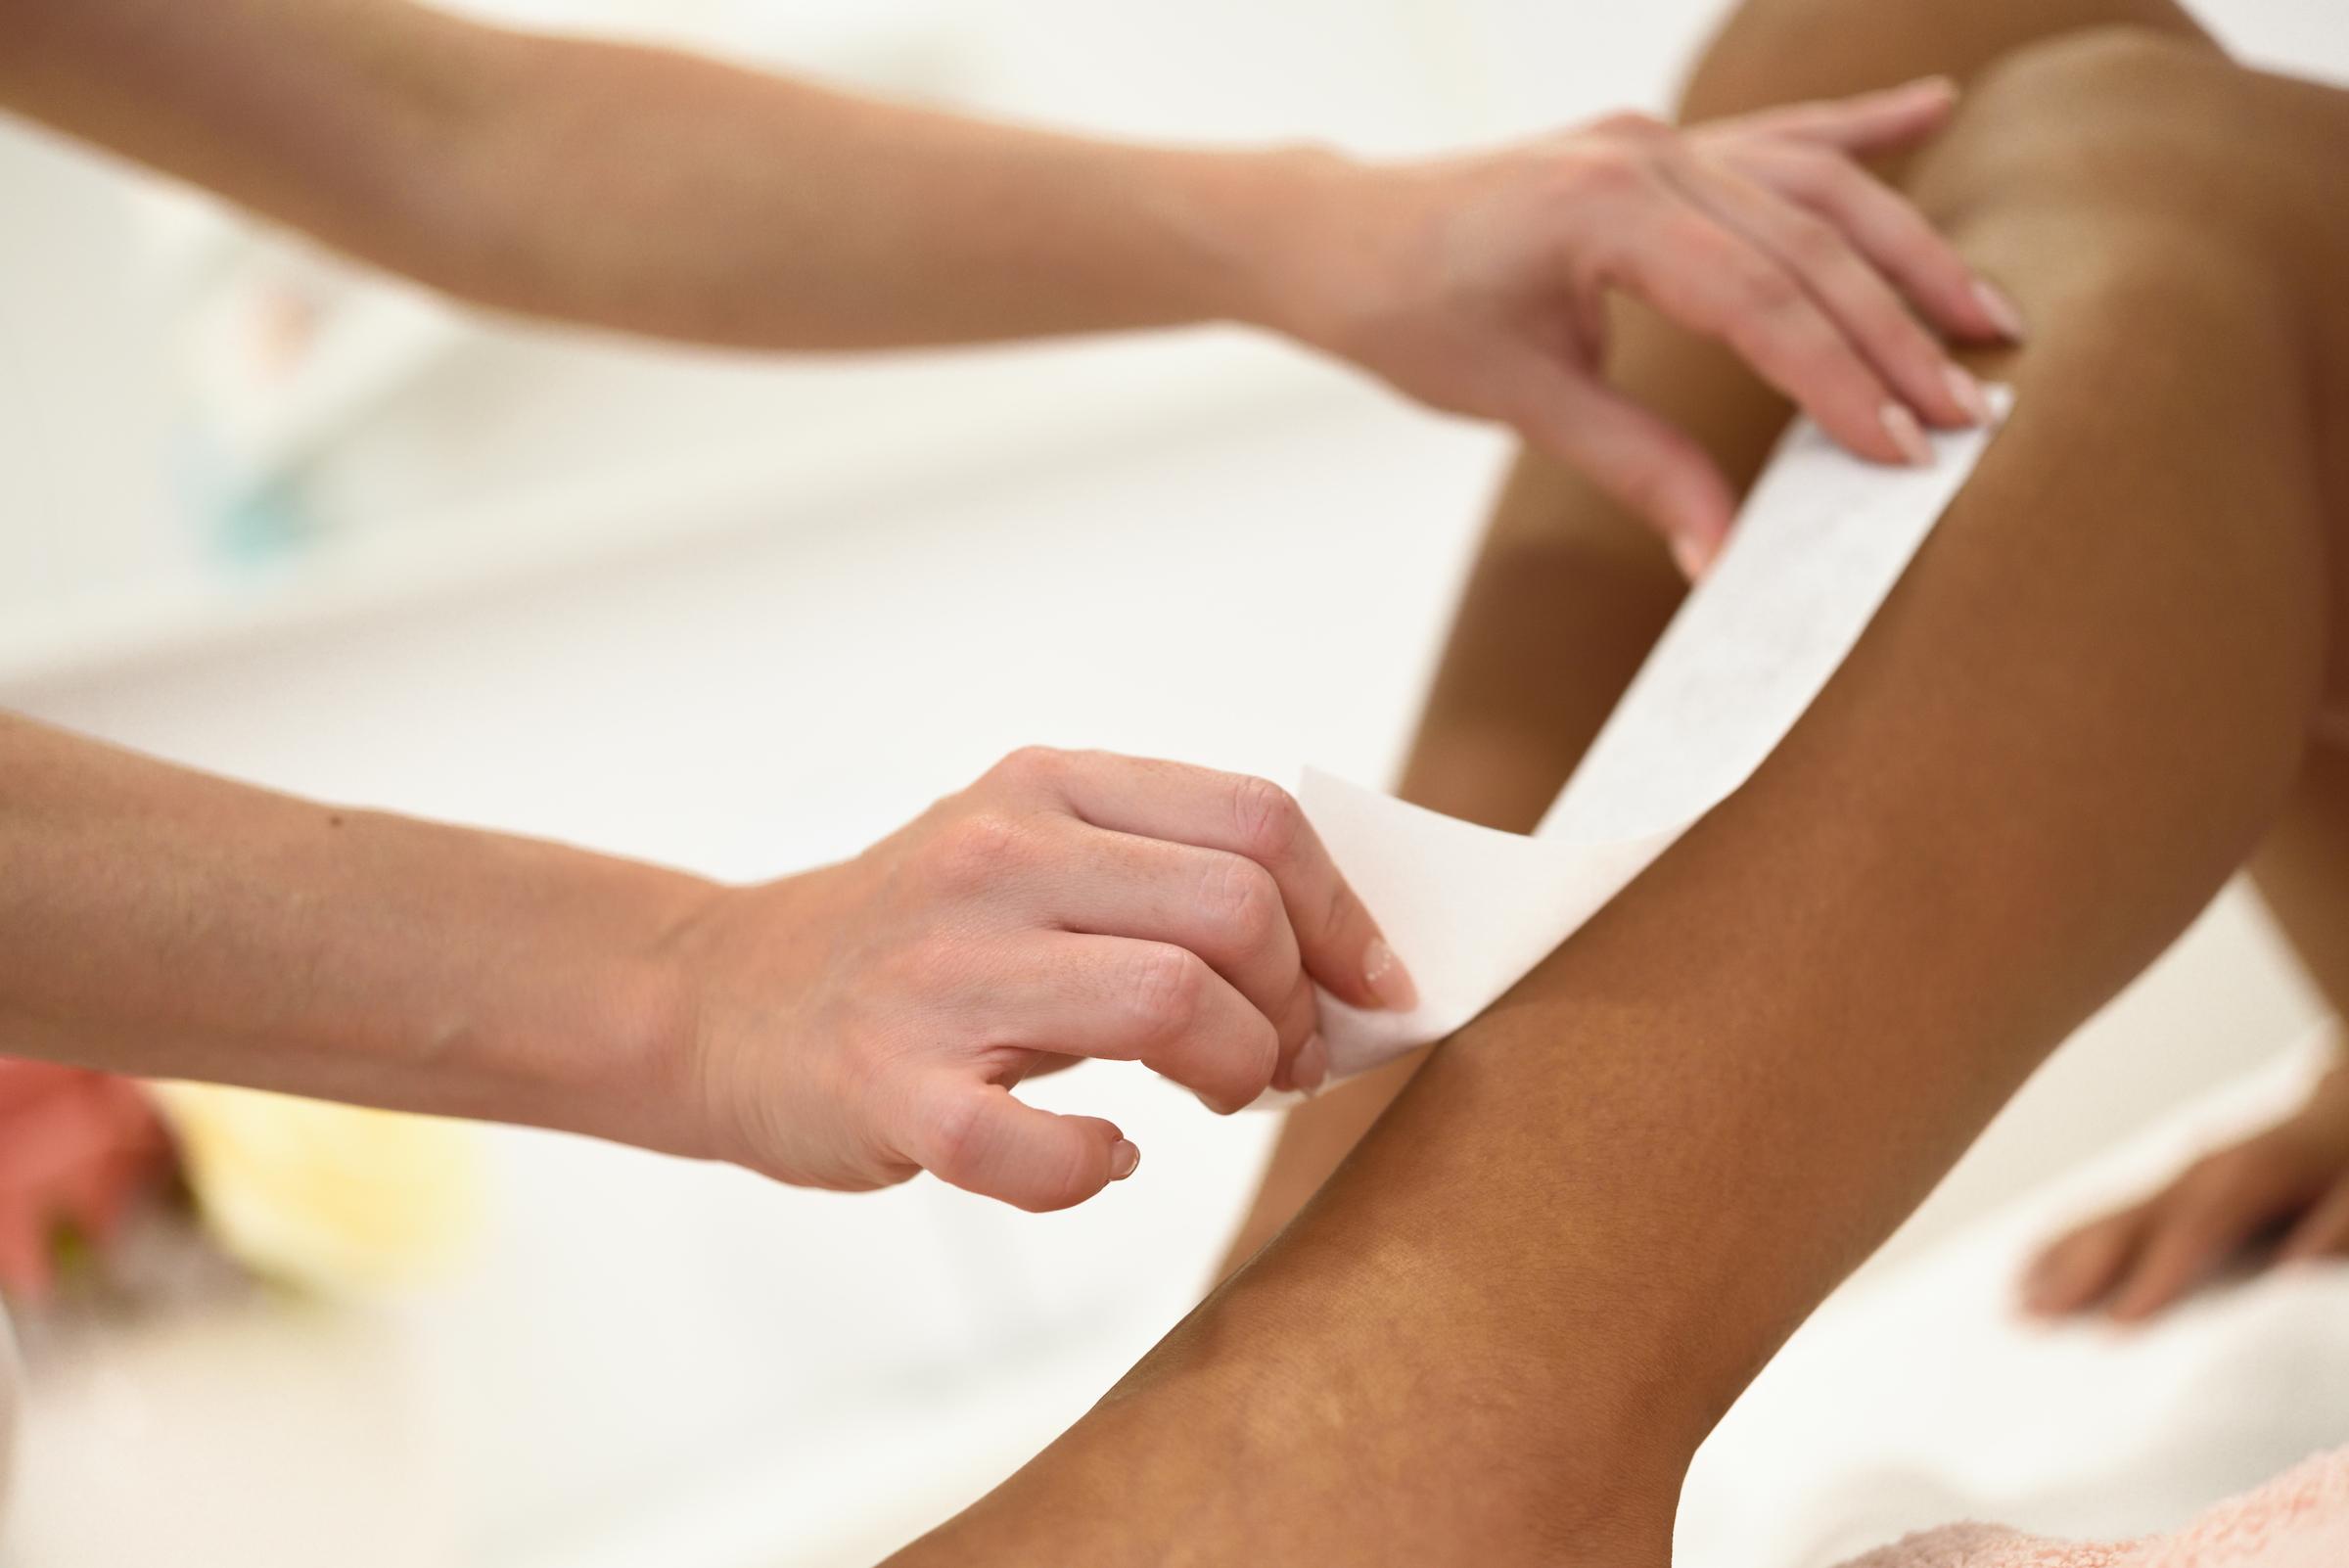 woman having hair removal procedure on leg applyin FX2MYTZ